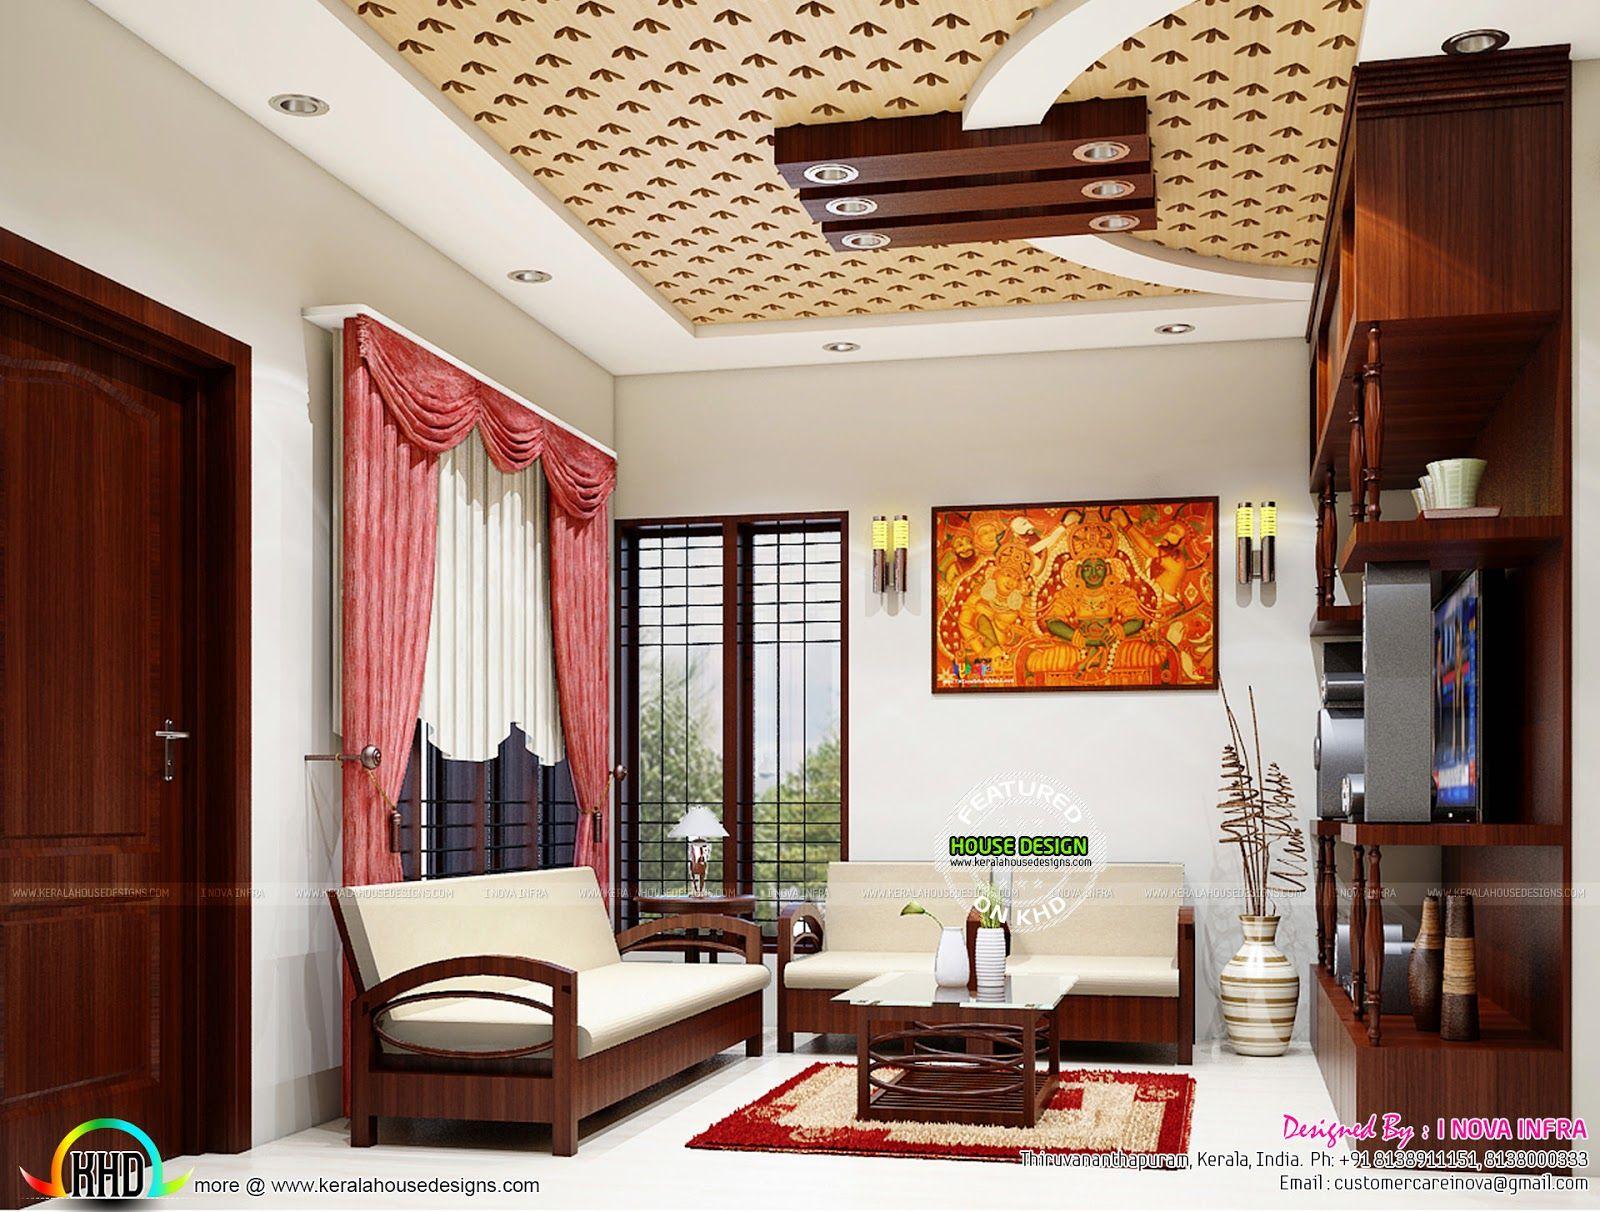 kerala traditional home interior designs home design on home interior design ideas id=79909